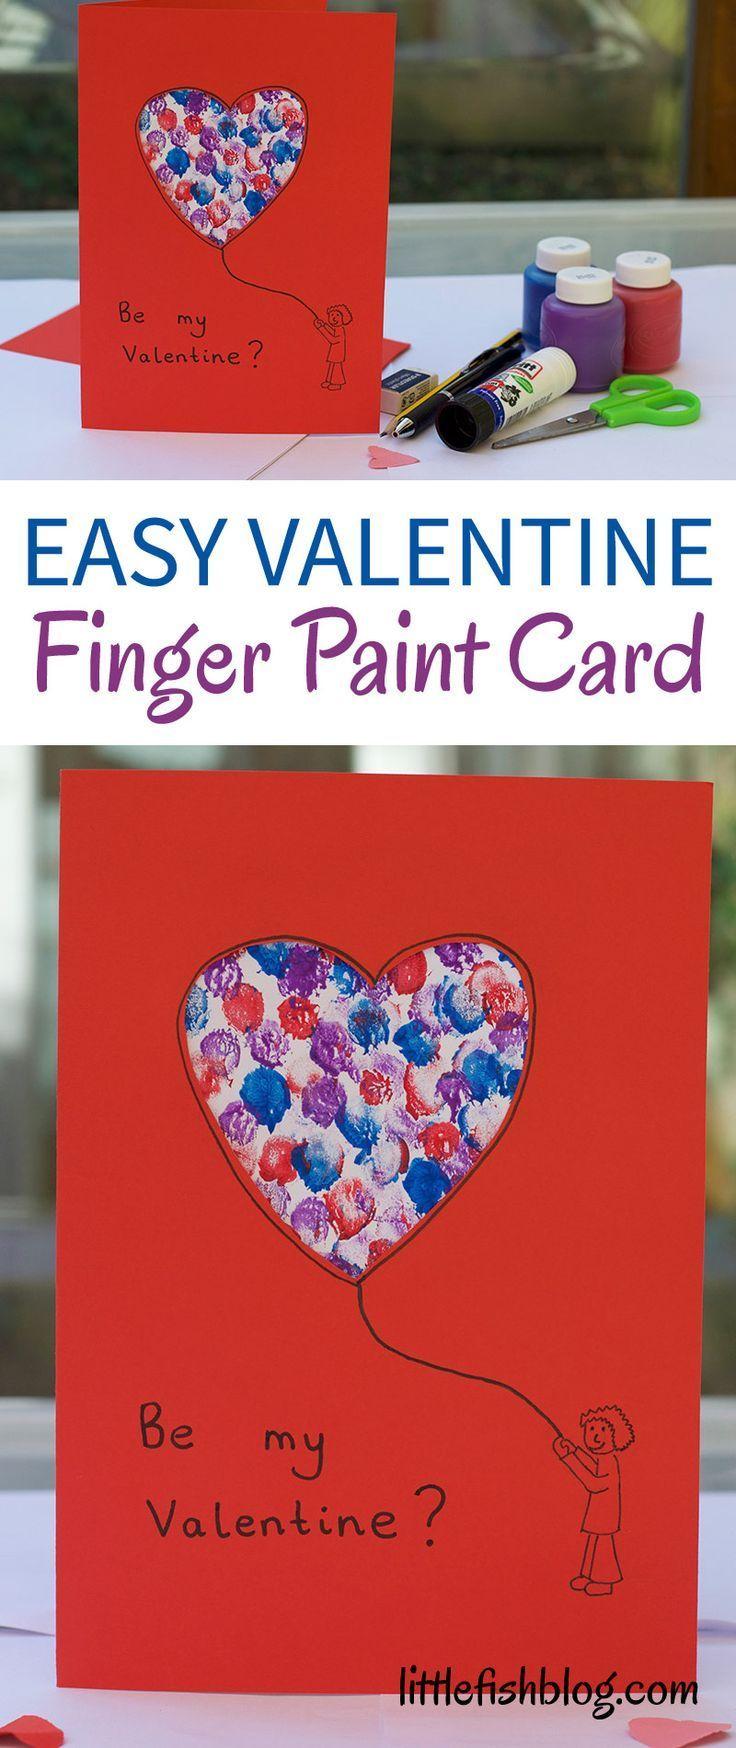 easy valentine finger paint card  little fish